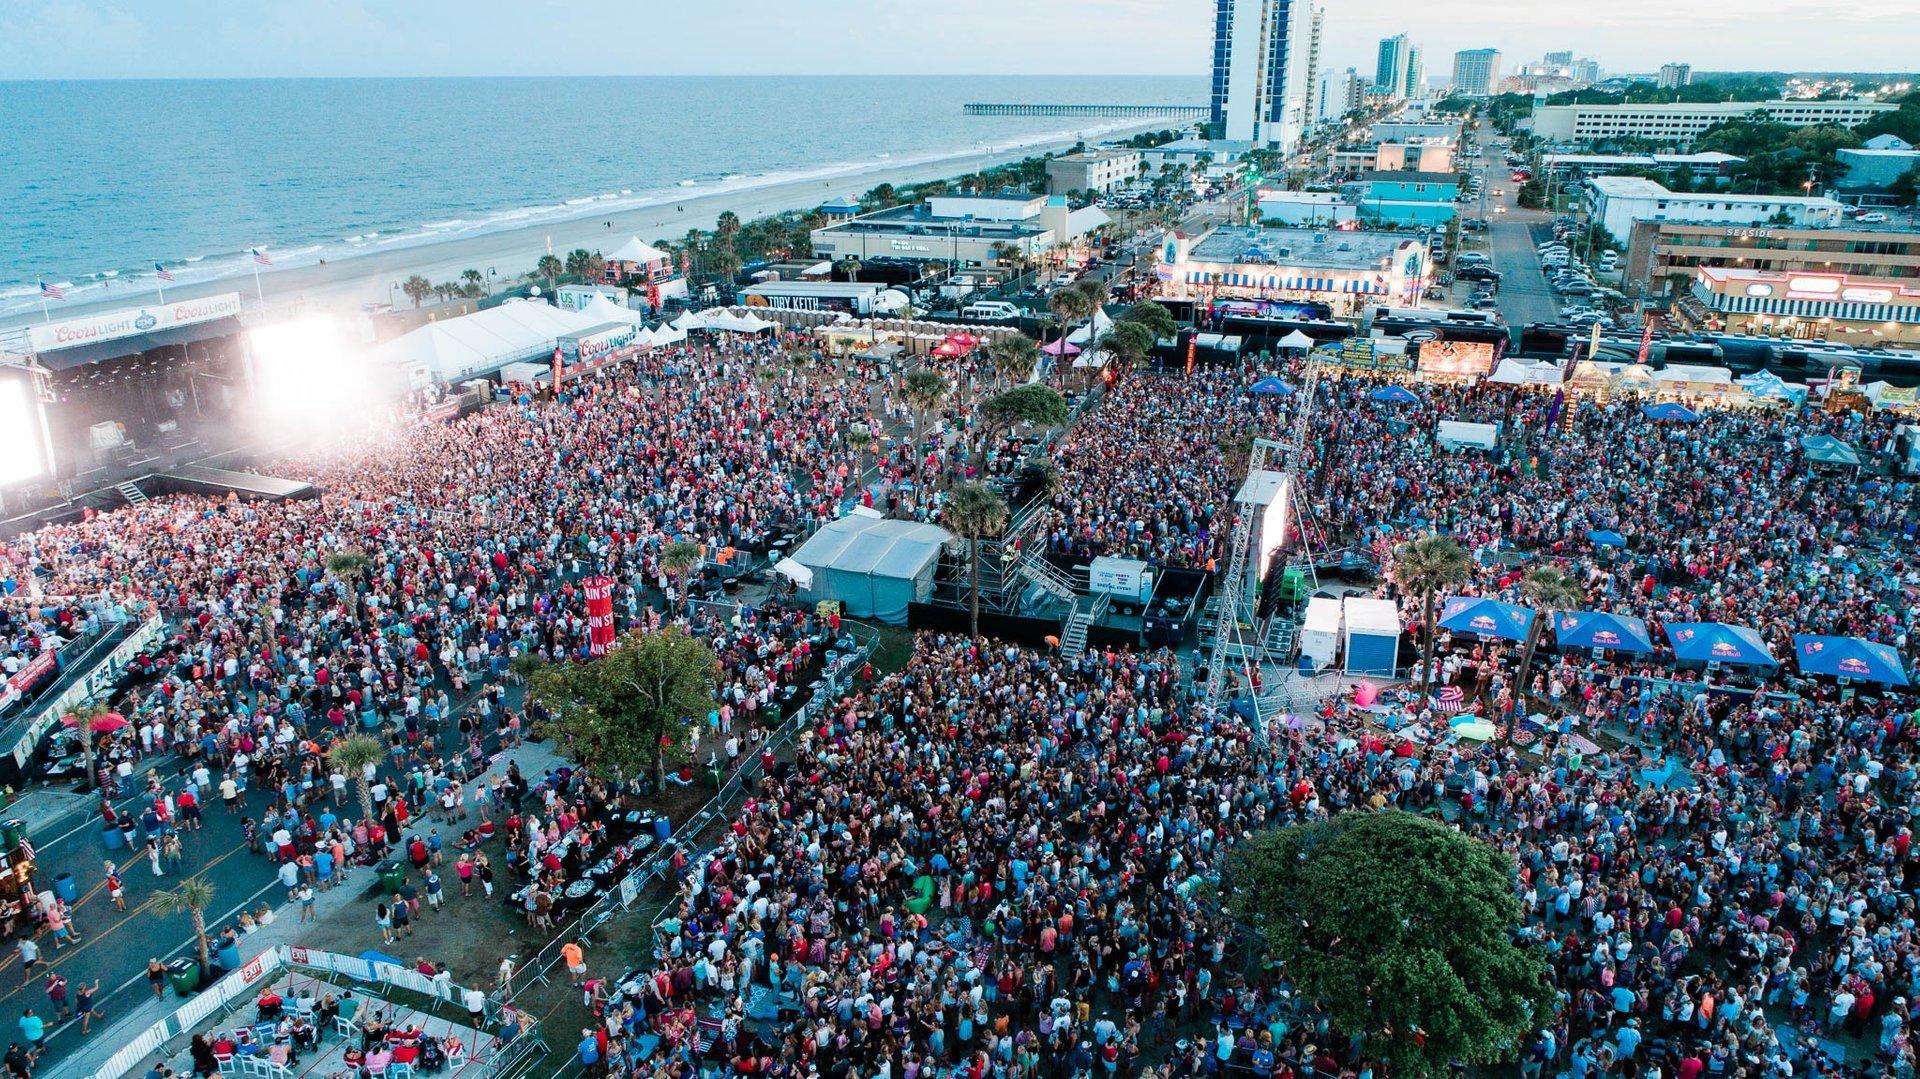 Myrtle Beach Country Music Festival 2020.Carolina Country Music Fest 2020 In South Carolina Dates Map